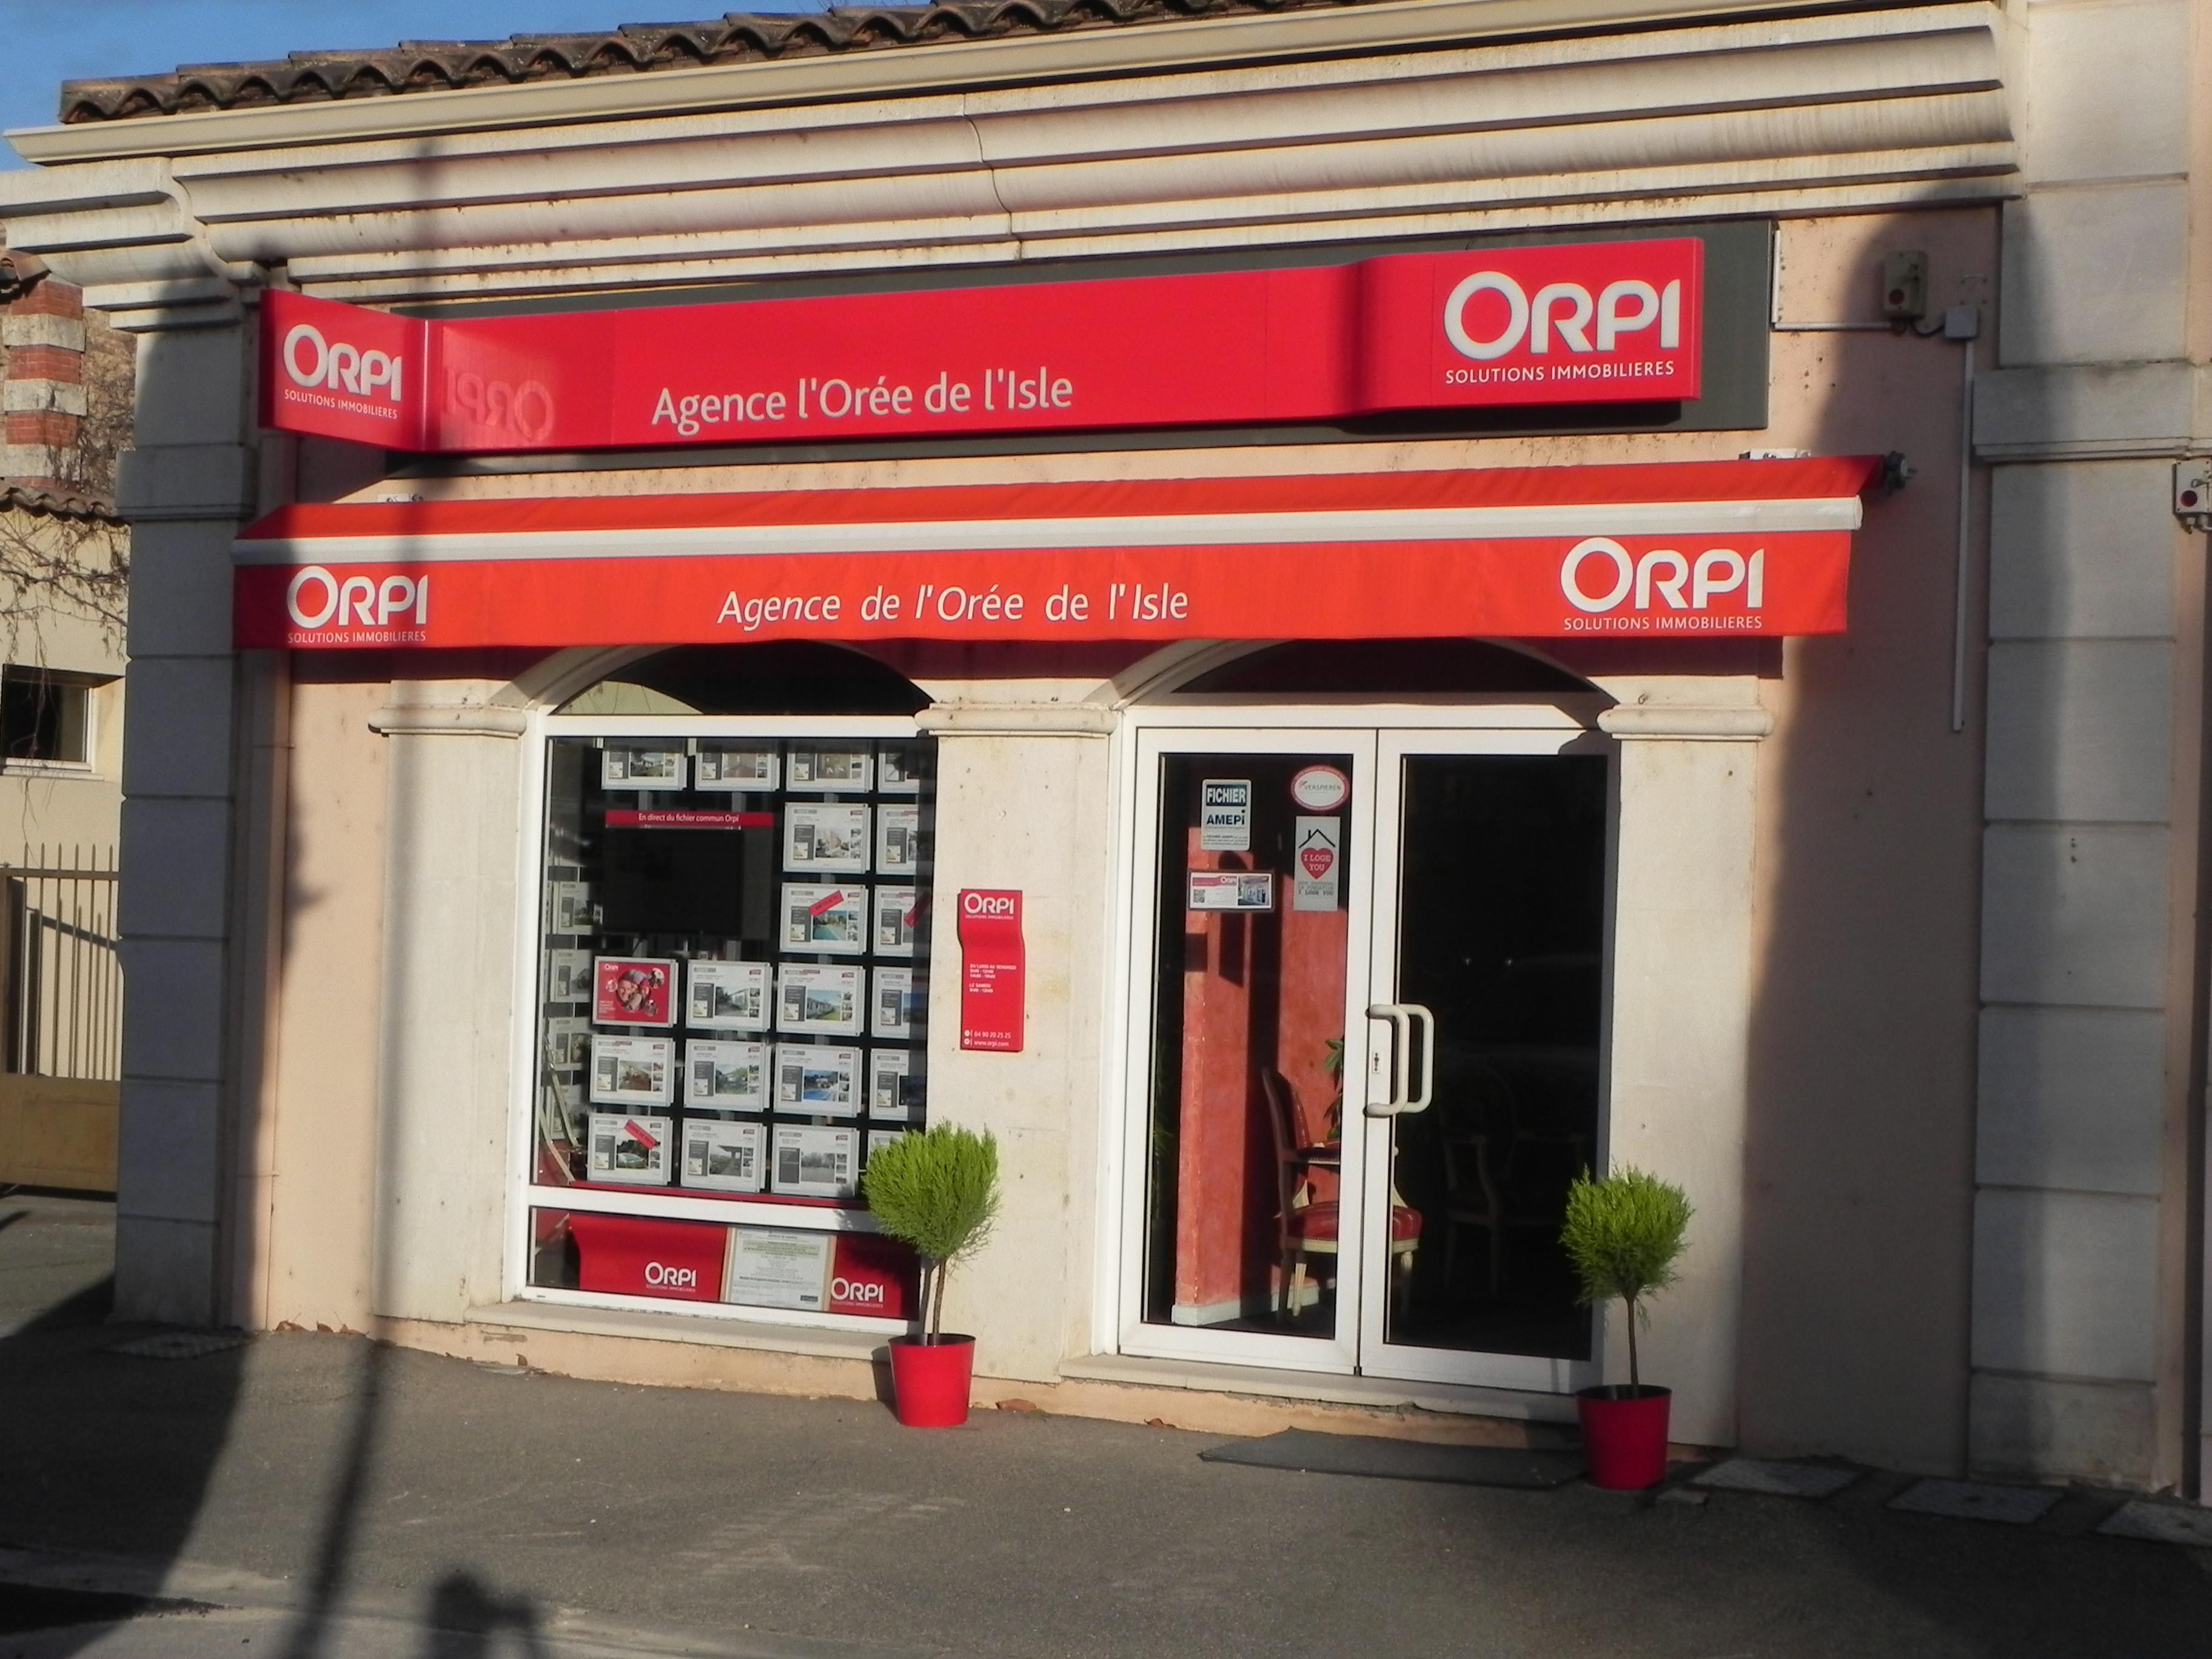 Image de l'agence ORPI - Agence L'orée De L'isle